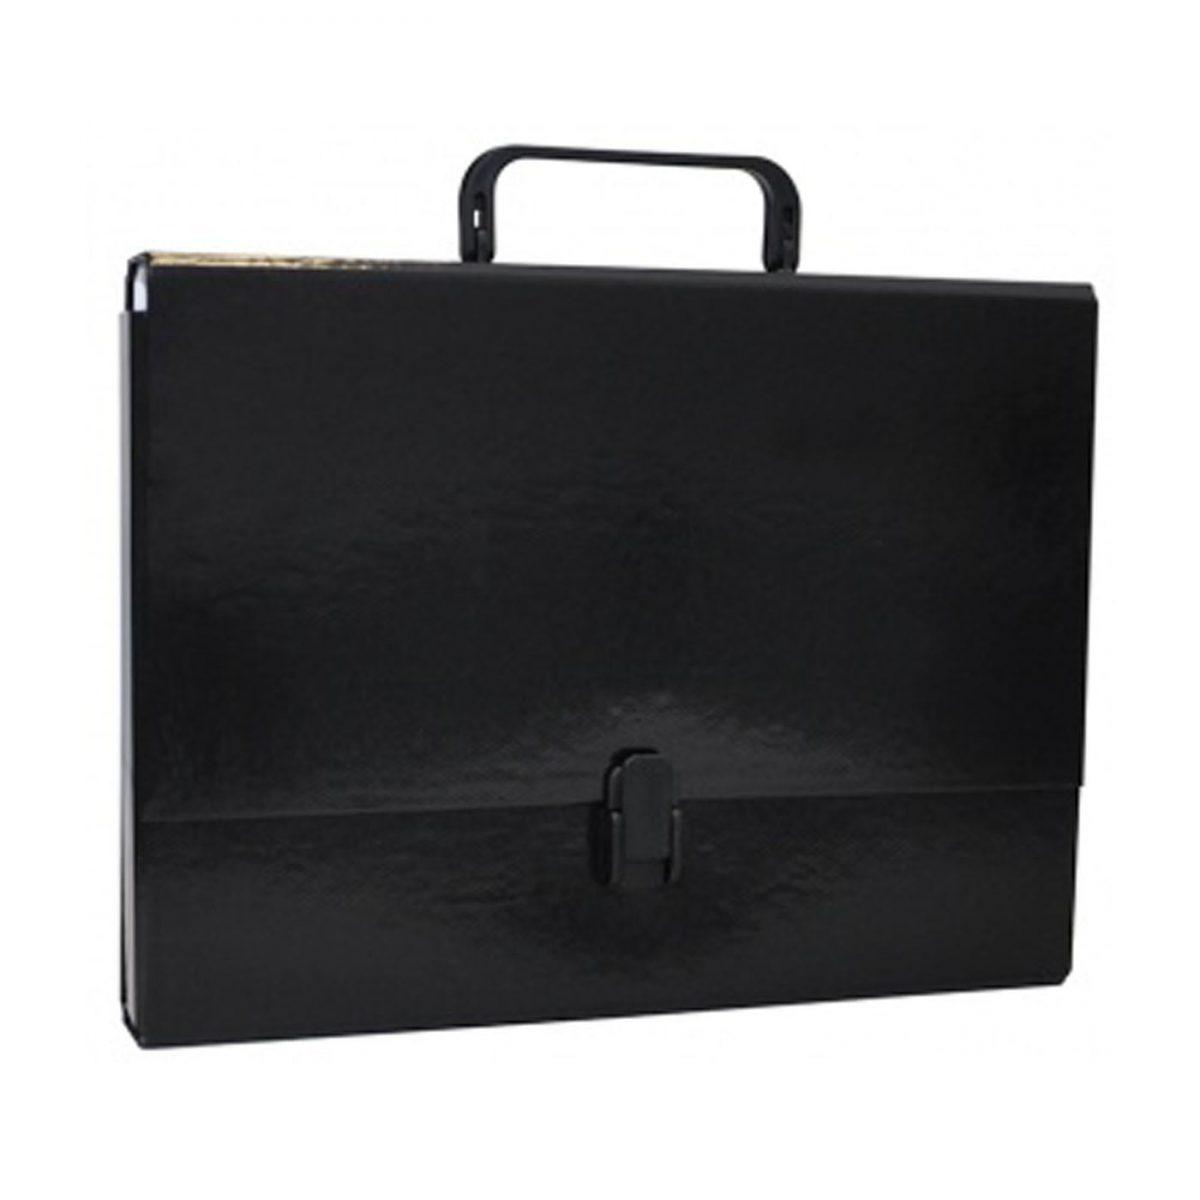 Servieta din carton laminat, A4/5cm, cu inchidere si maner, Office Products - negru